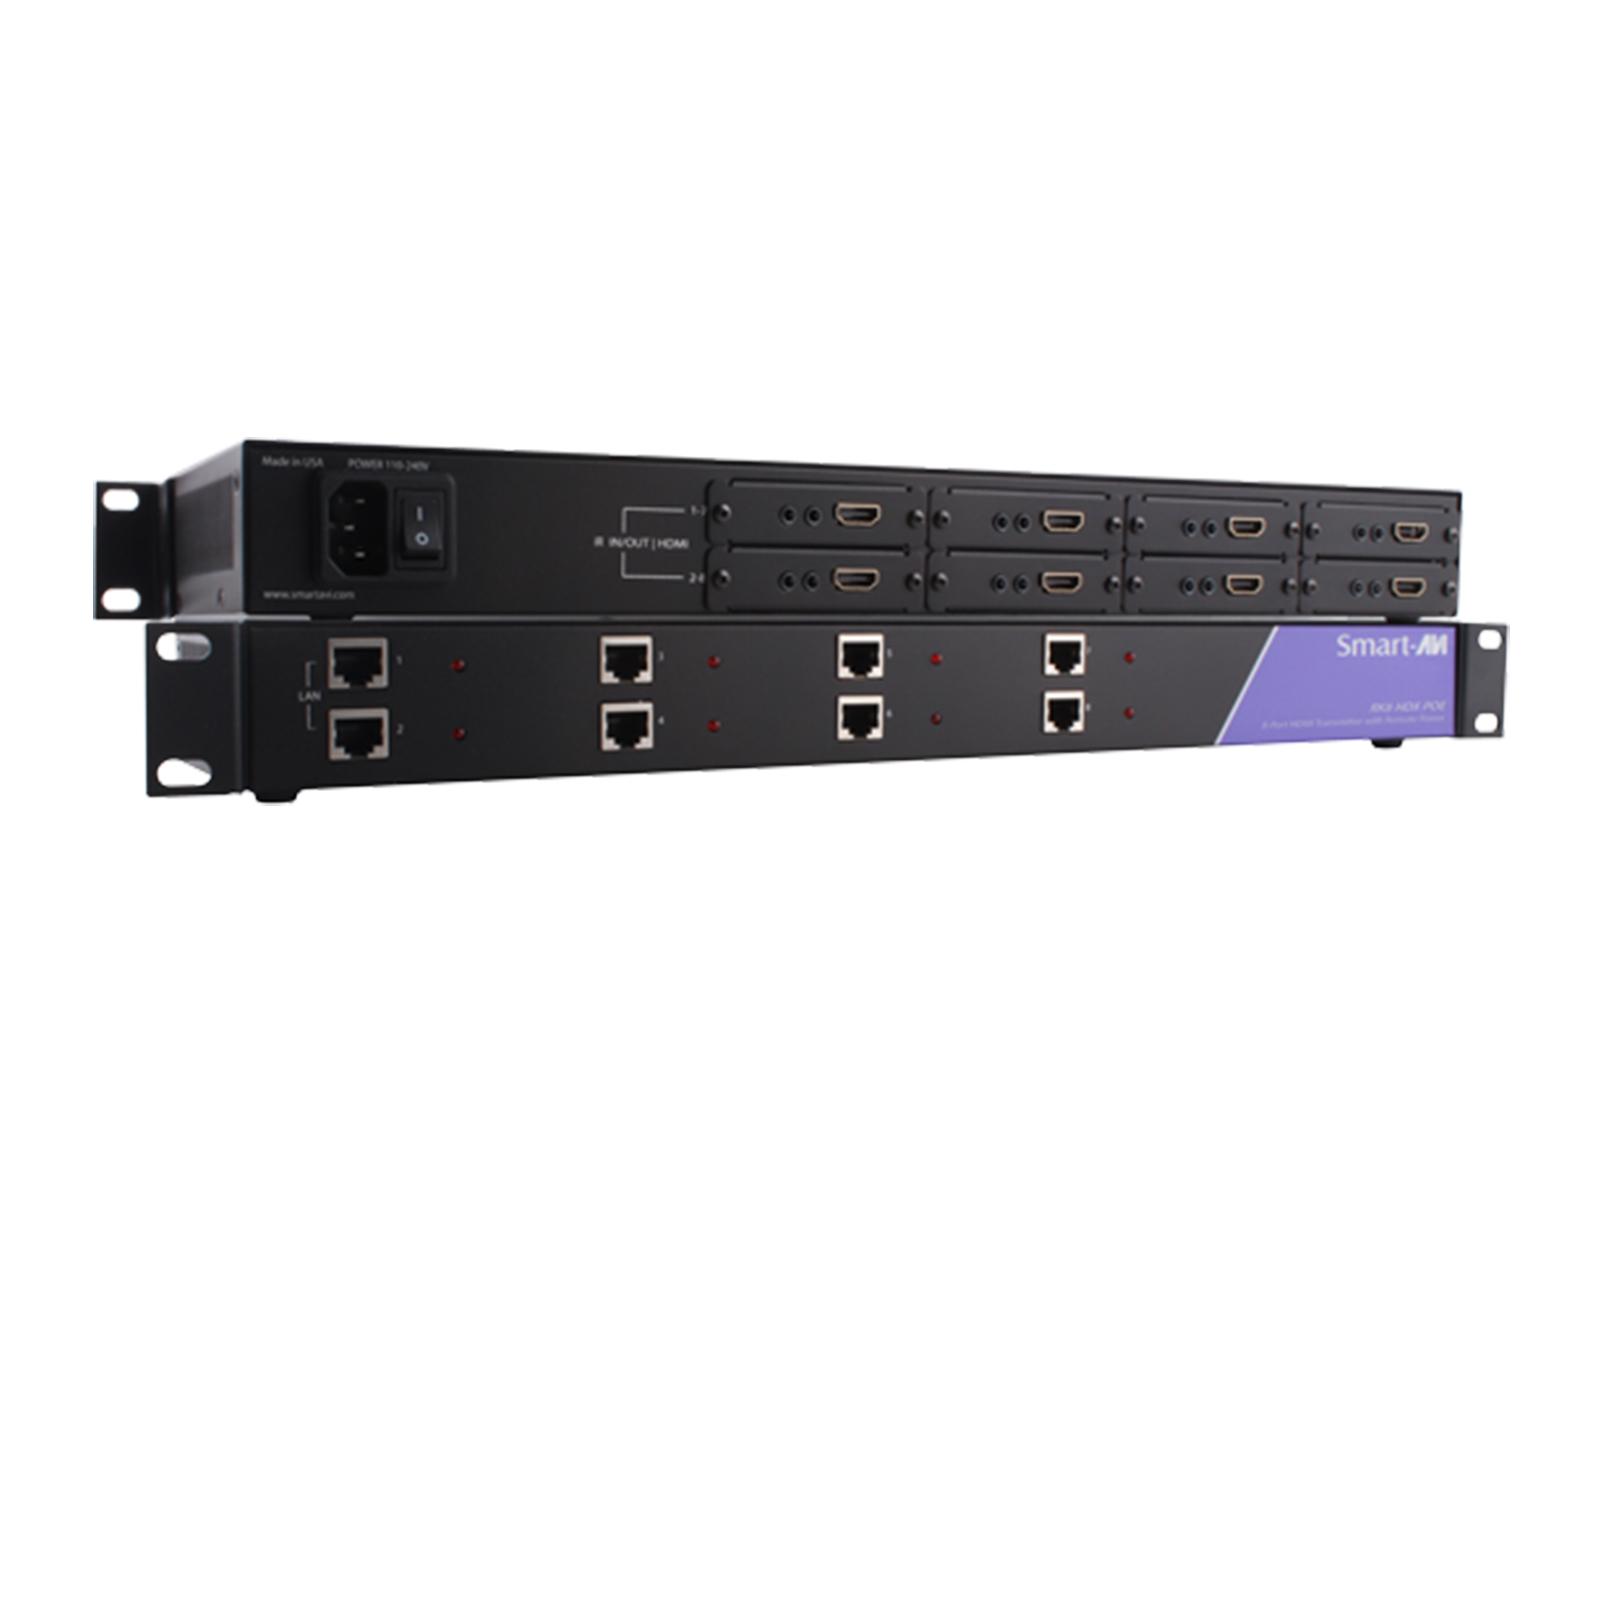 SmartAVI RK8-HDX-POE-S HDBaseT Rack Mount 8-Port HDMI & IR over Cat5e/6